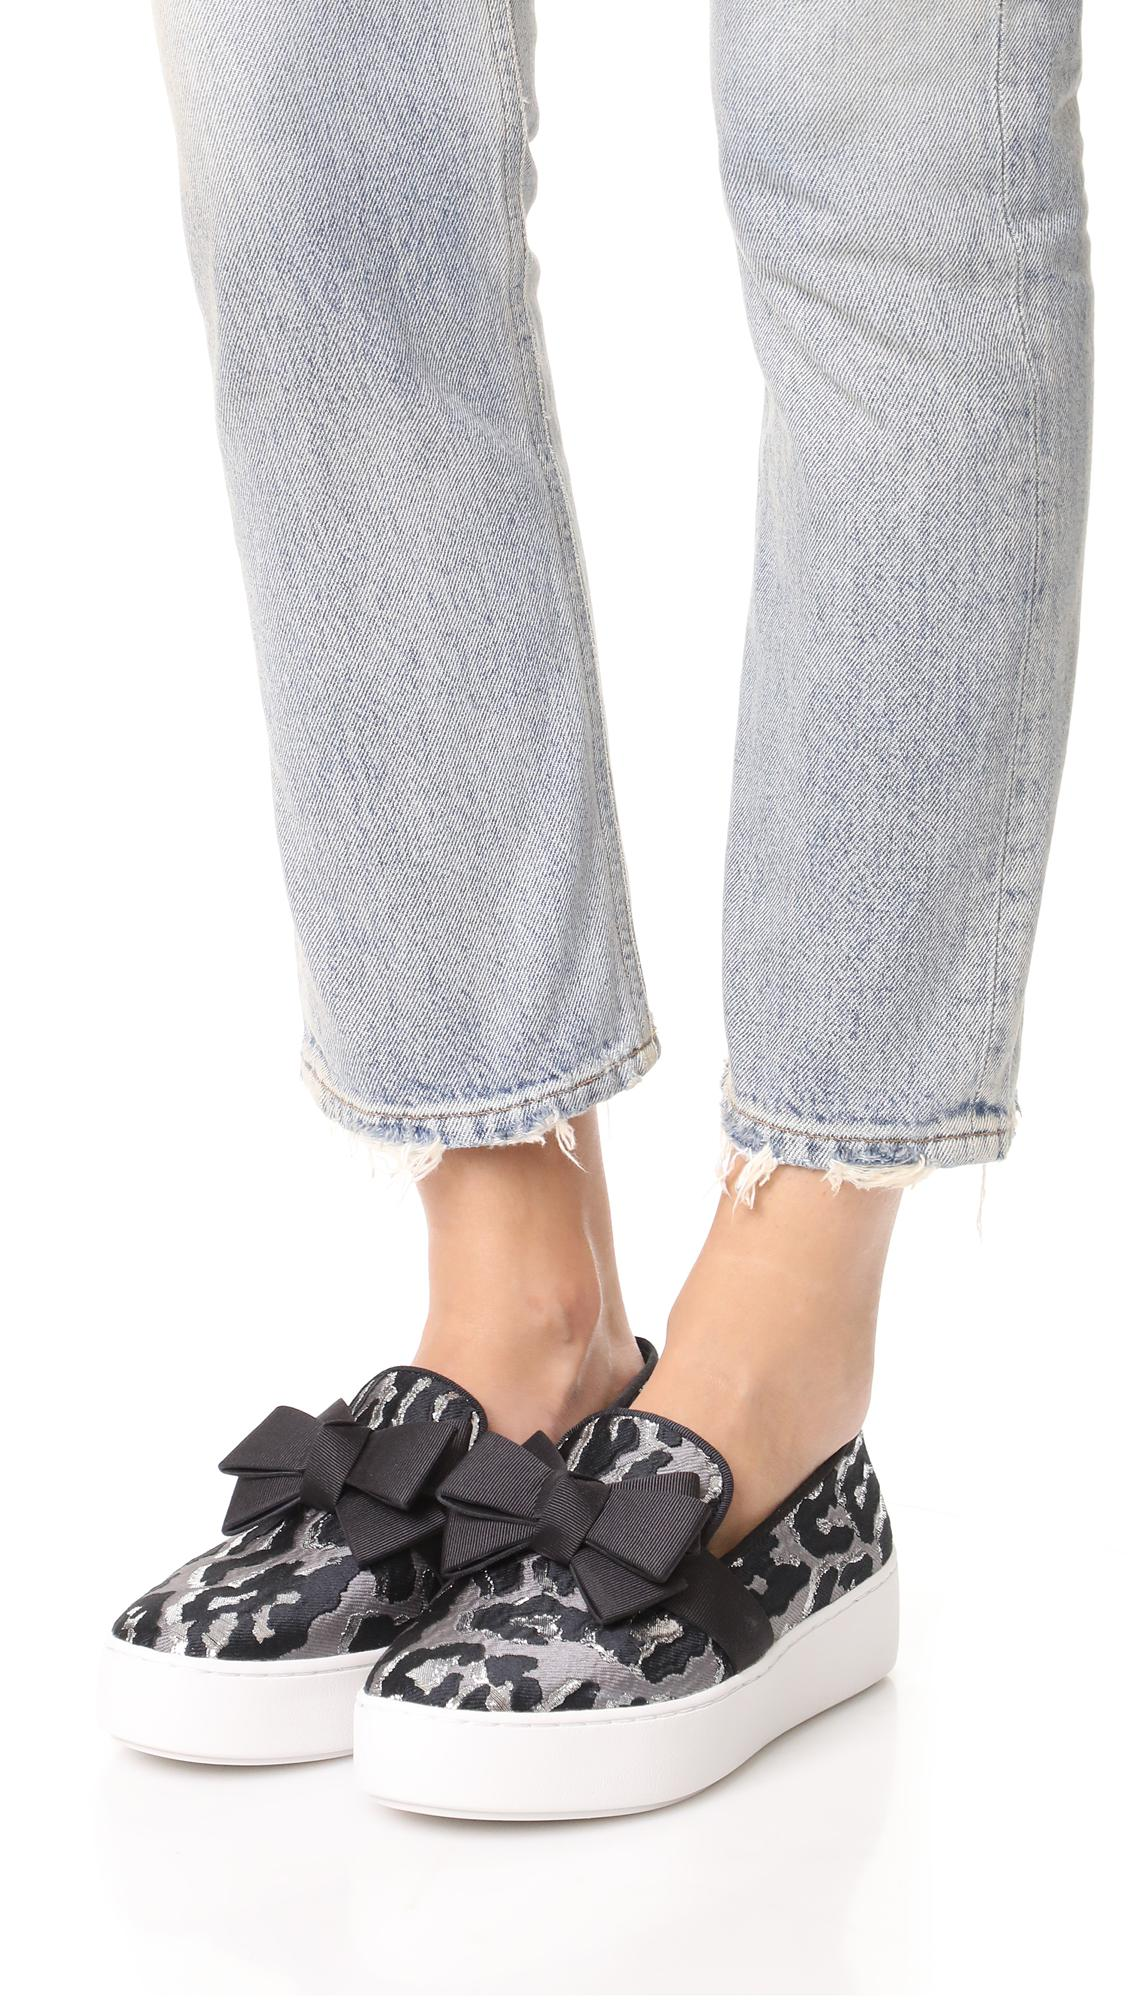 Michael Kors Rubber Val Platform Slip On Sneakers